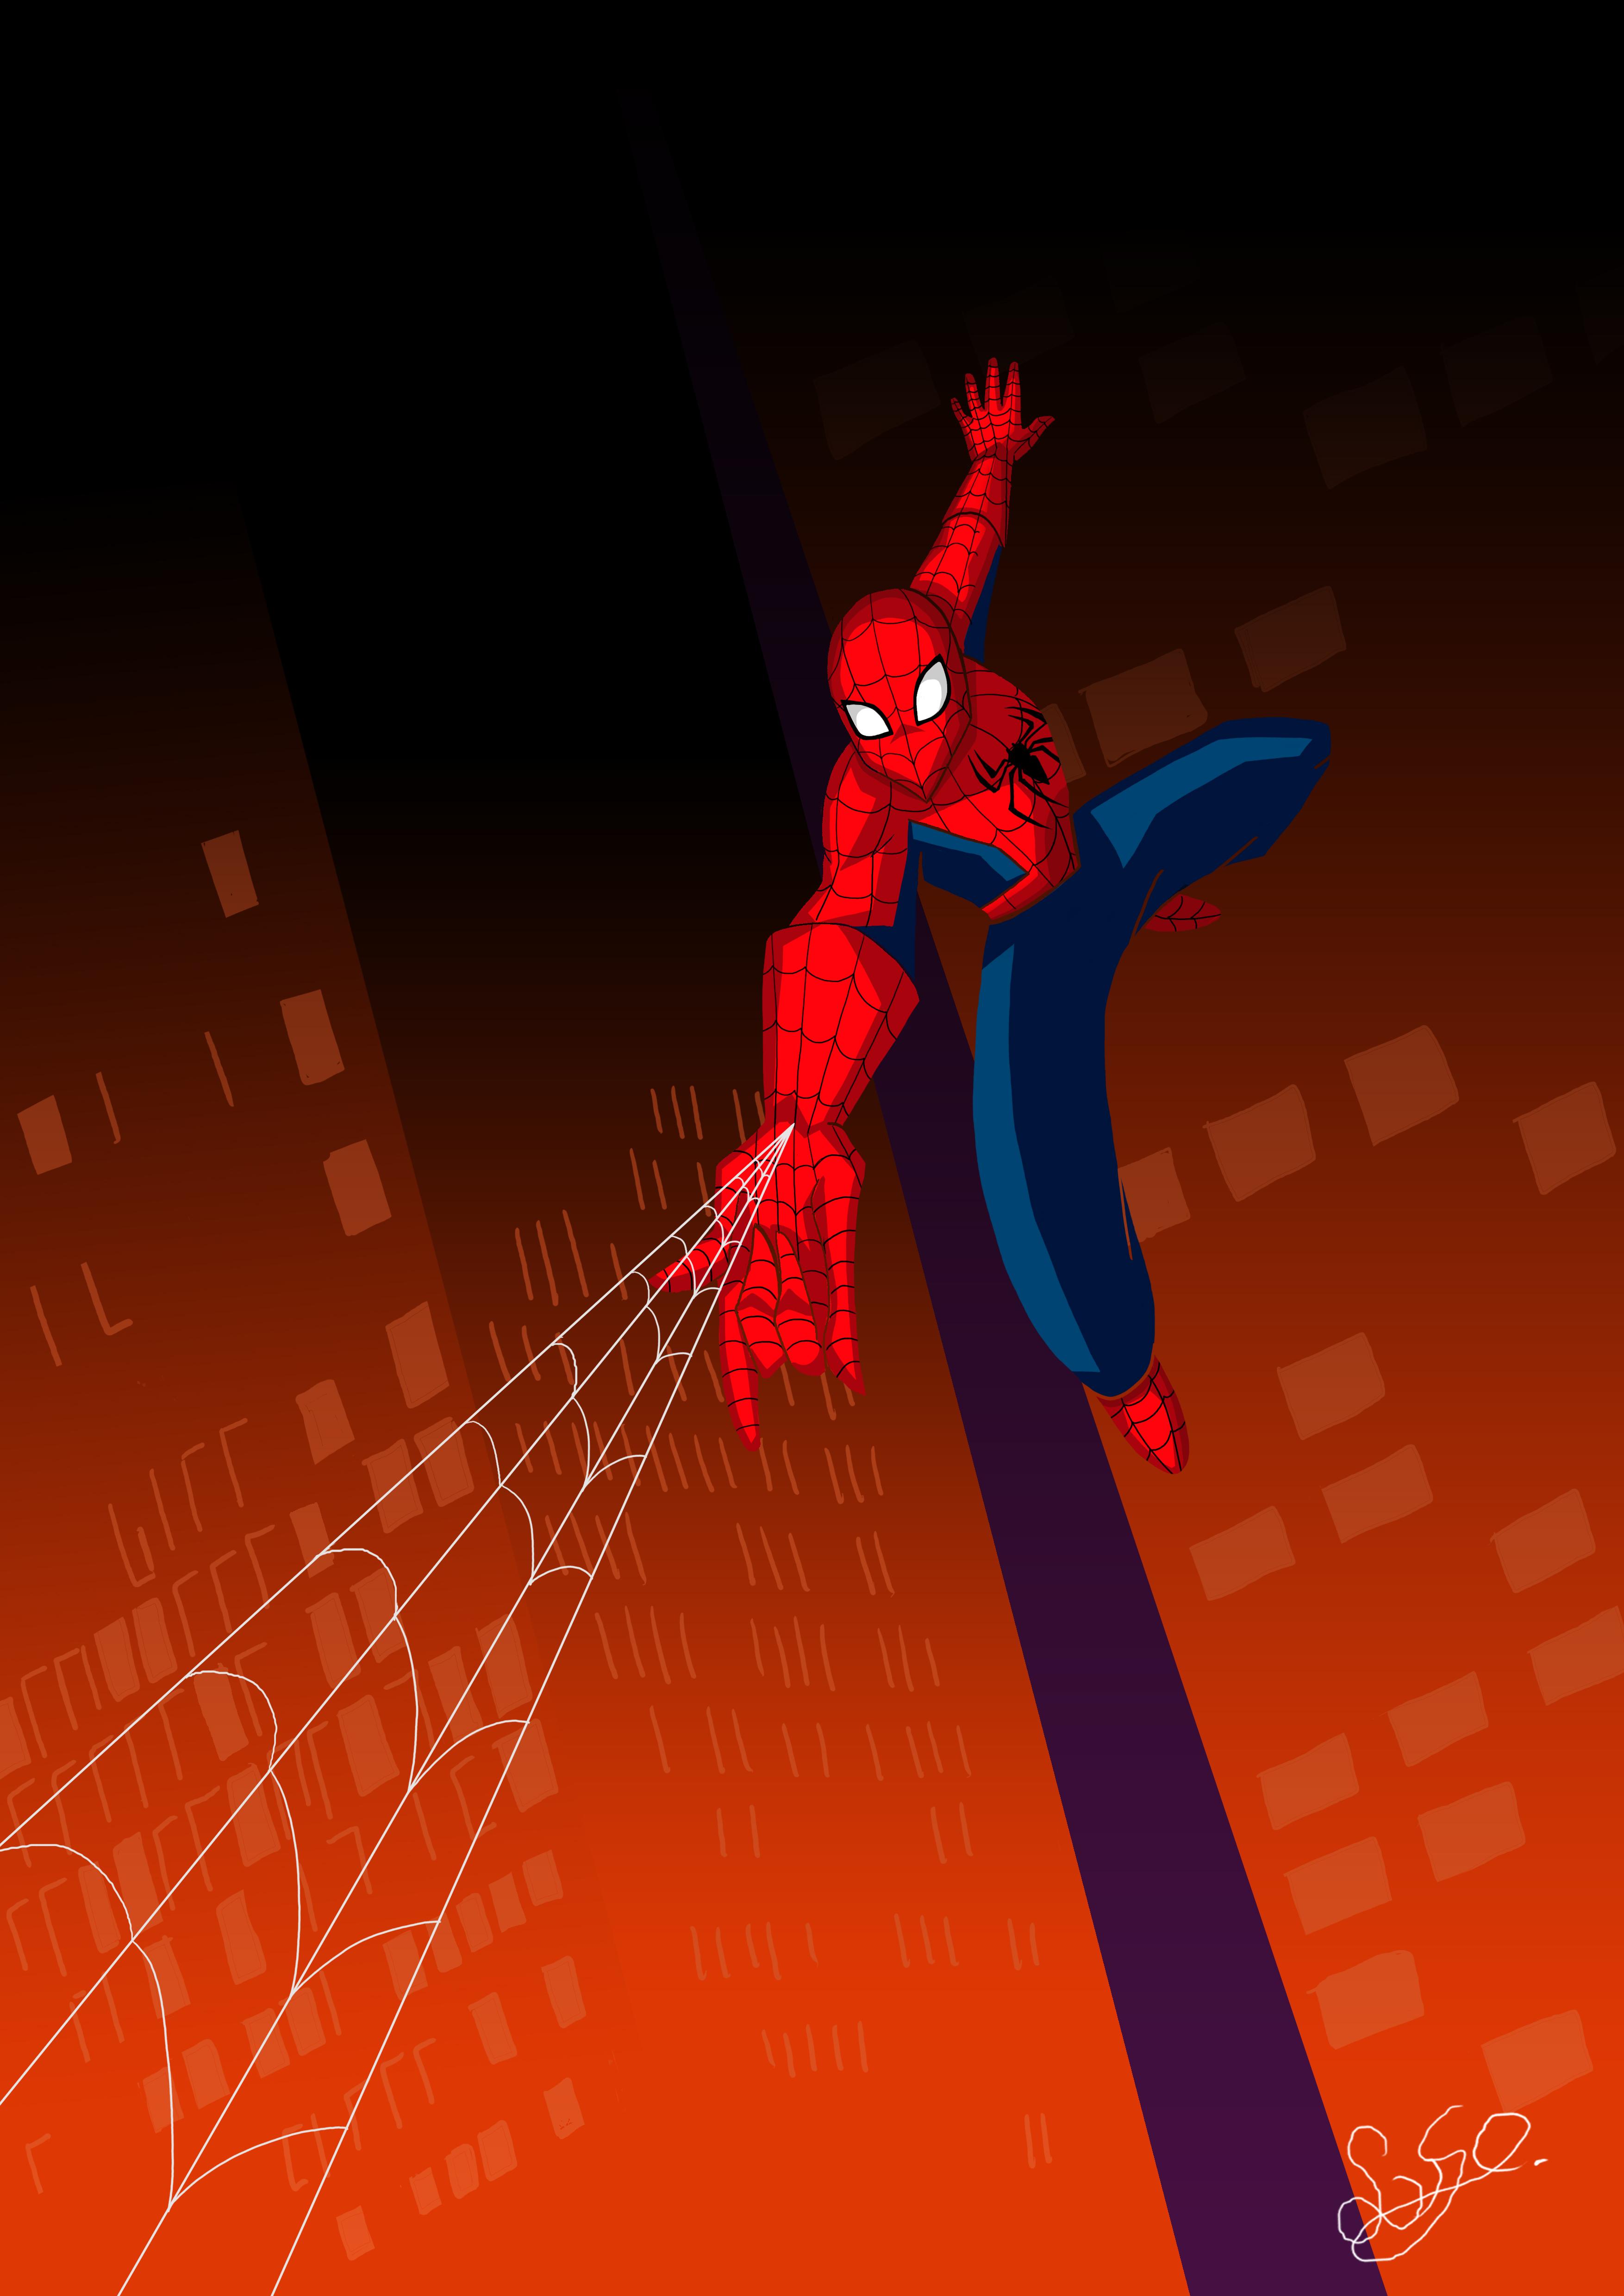 poster, illustratie, spiderman, Marvel comics, spiderweb